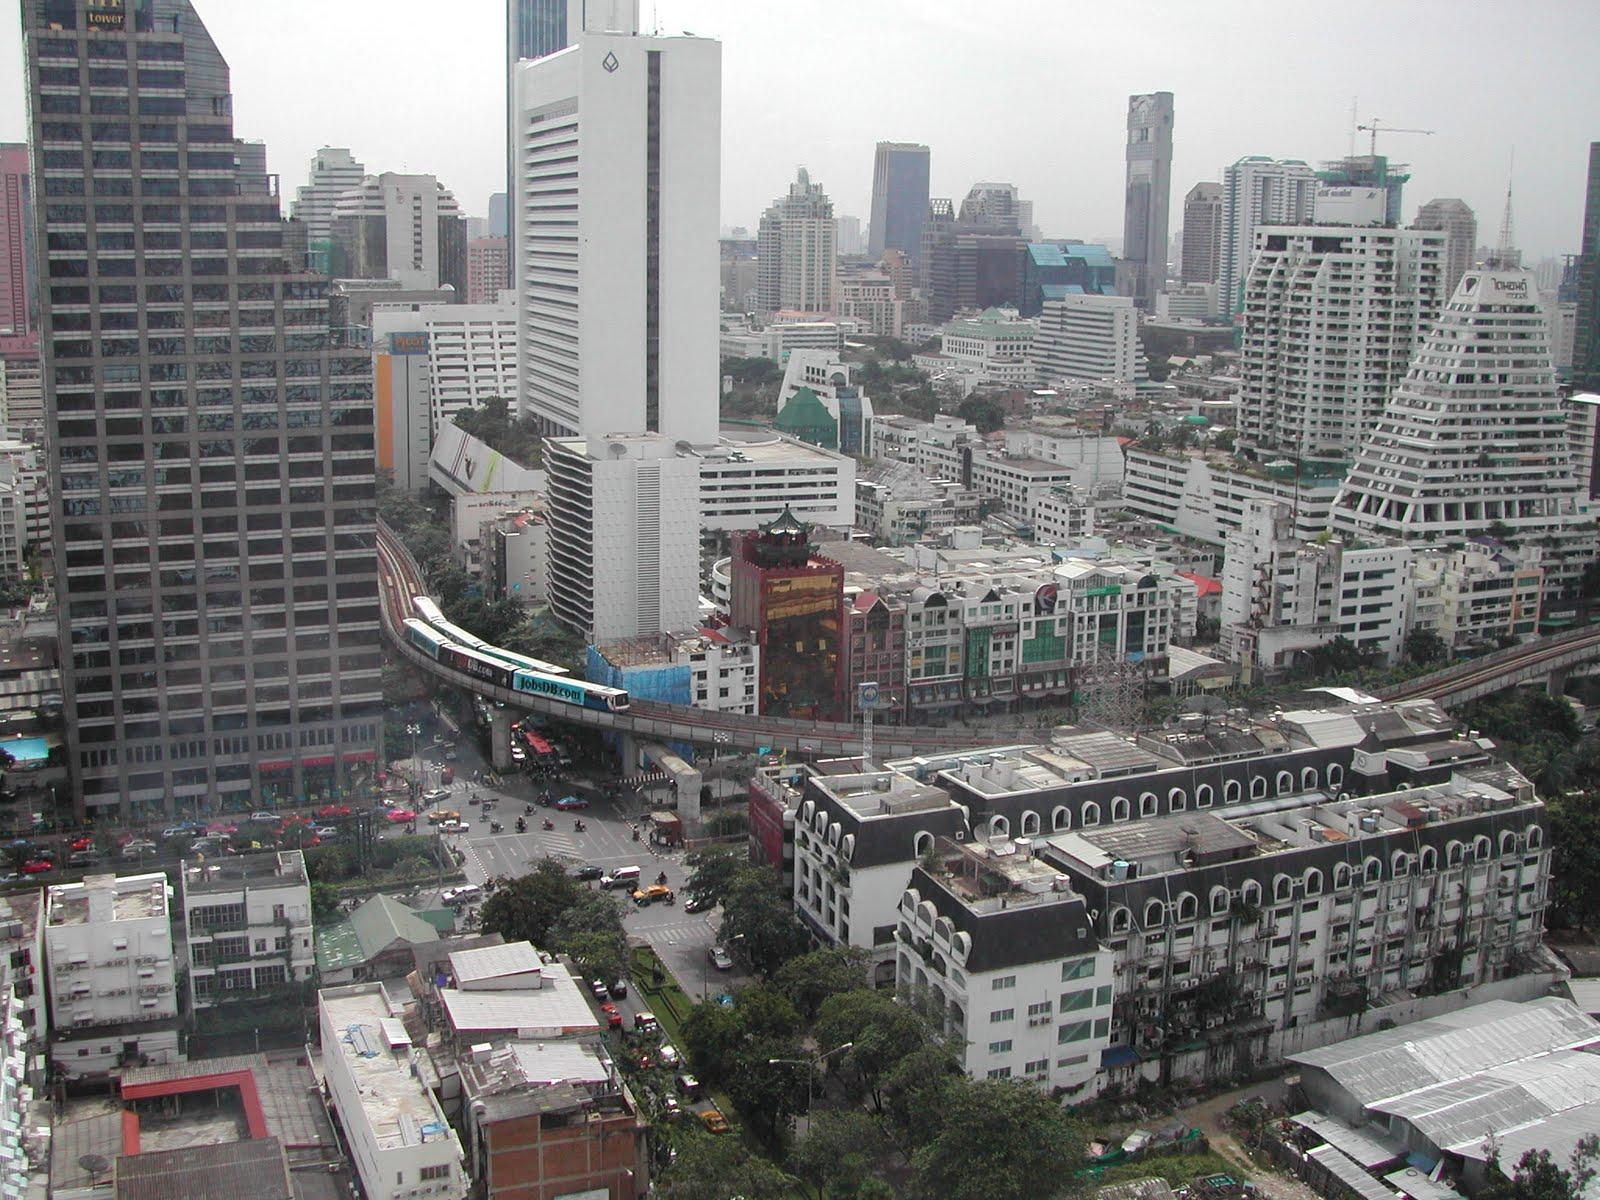 http://3.bp.blogspot.com/-K05557ii0J8/TZBZqzAFioI/AAAAAAAAAww/IHXlJqyjzQE/s1600/Bangkok_city.jpg